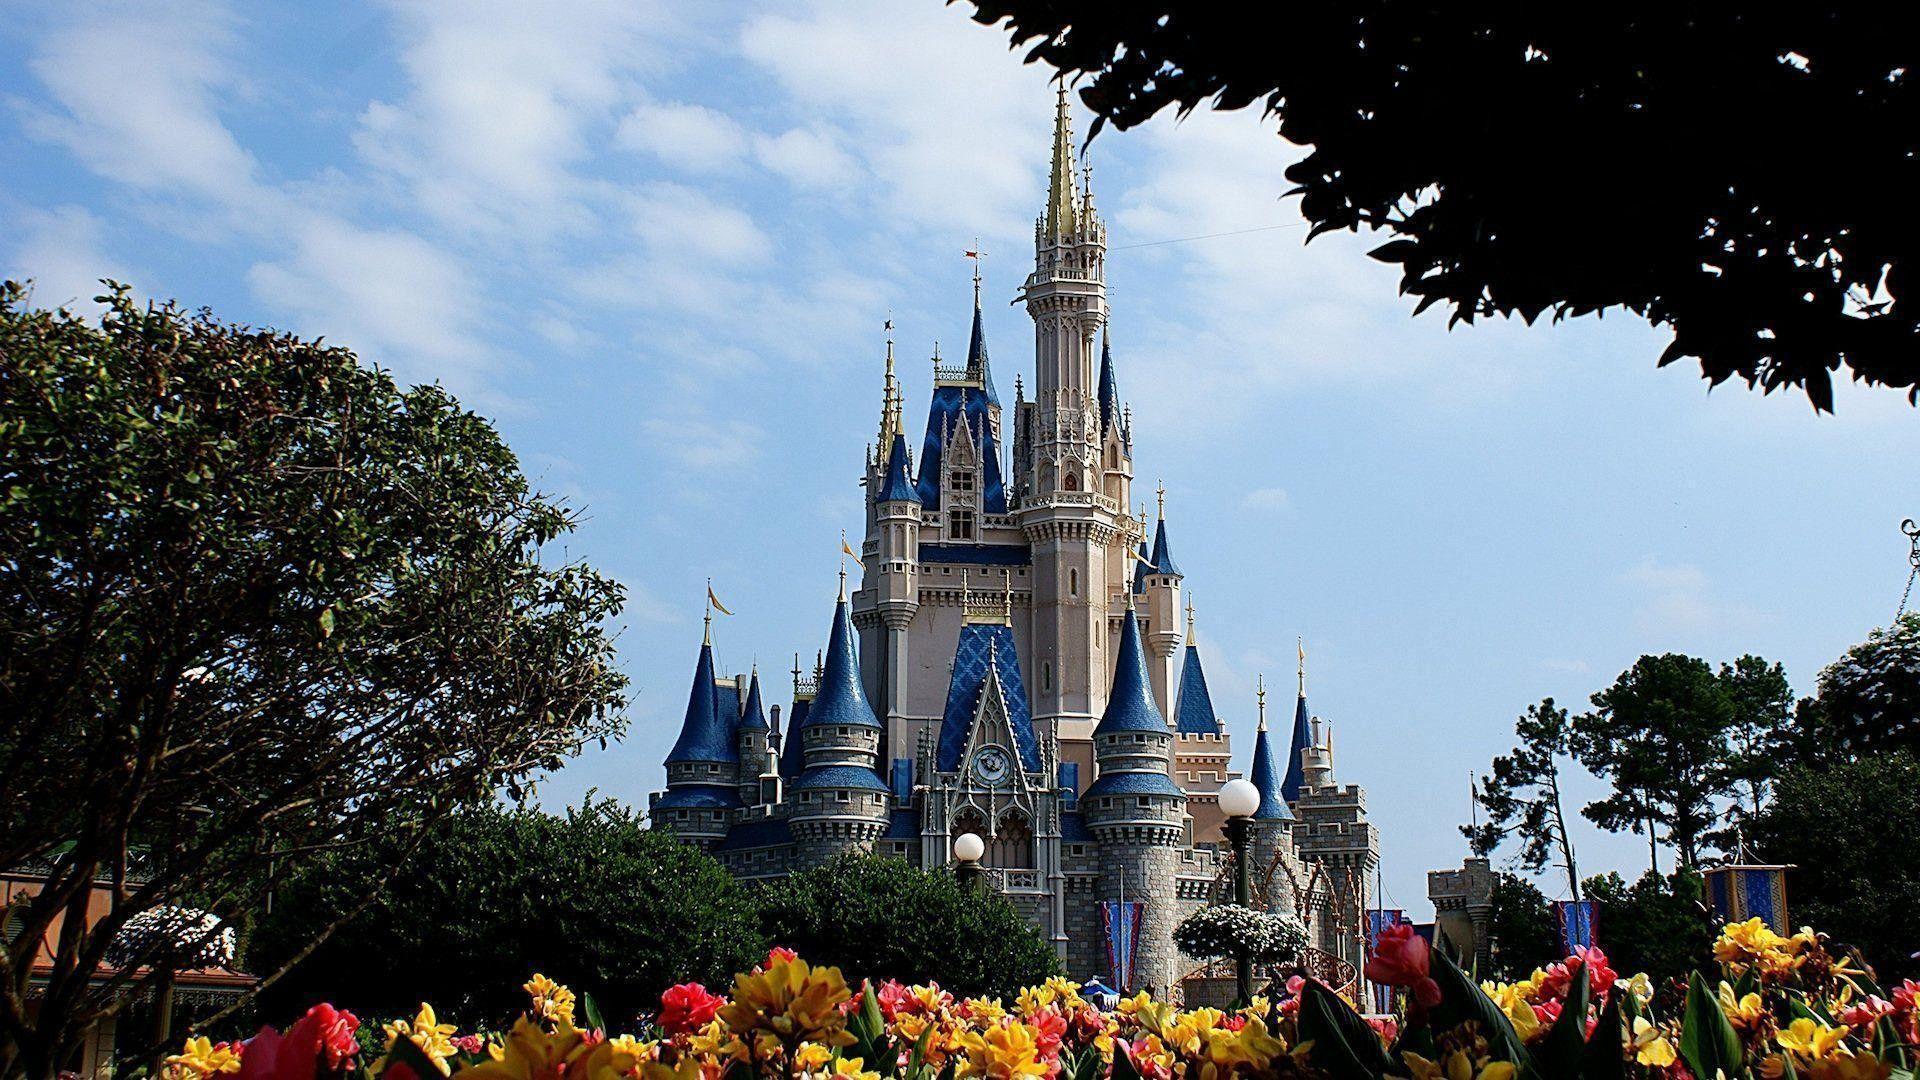 Disney World Landscape Desktop Wallpapers Top Free Disney World Landscape Desktop Backgrounds Wallpaperaccess